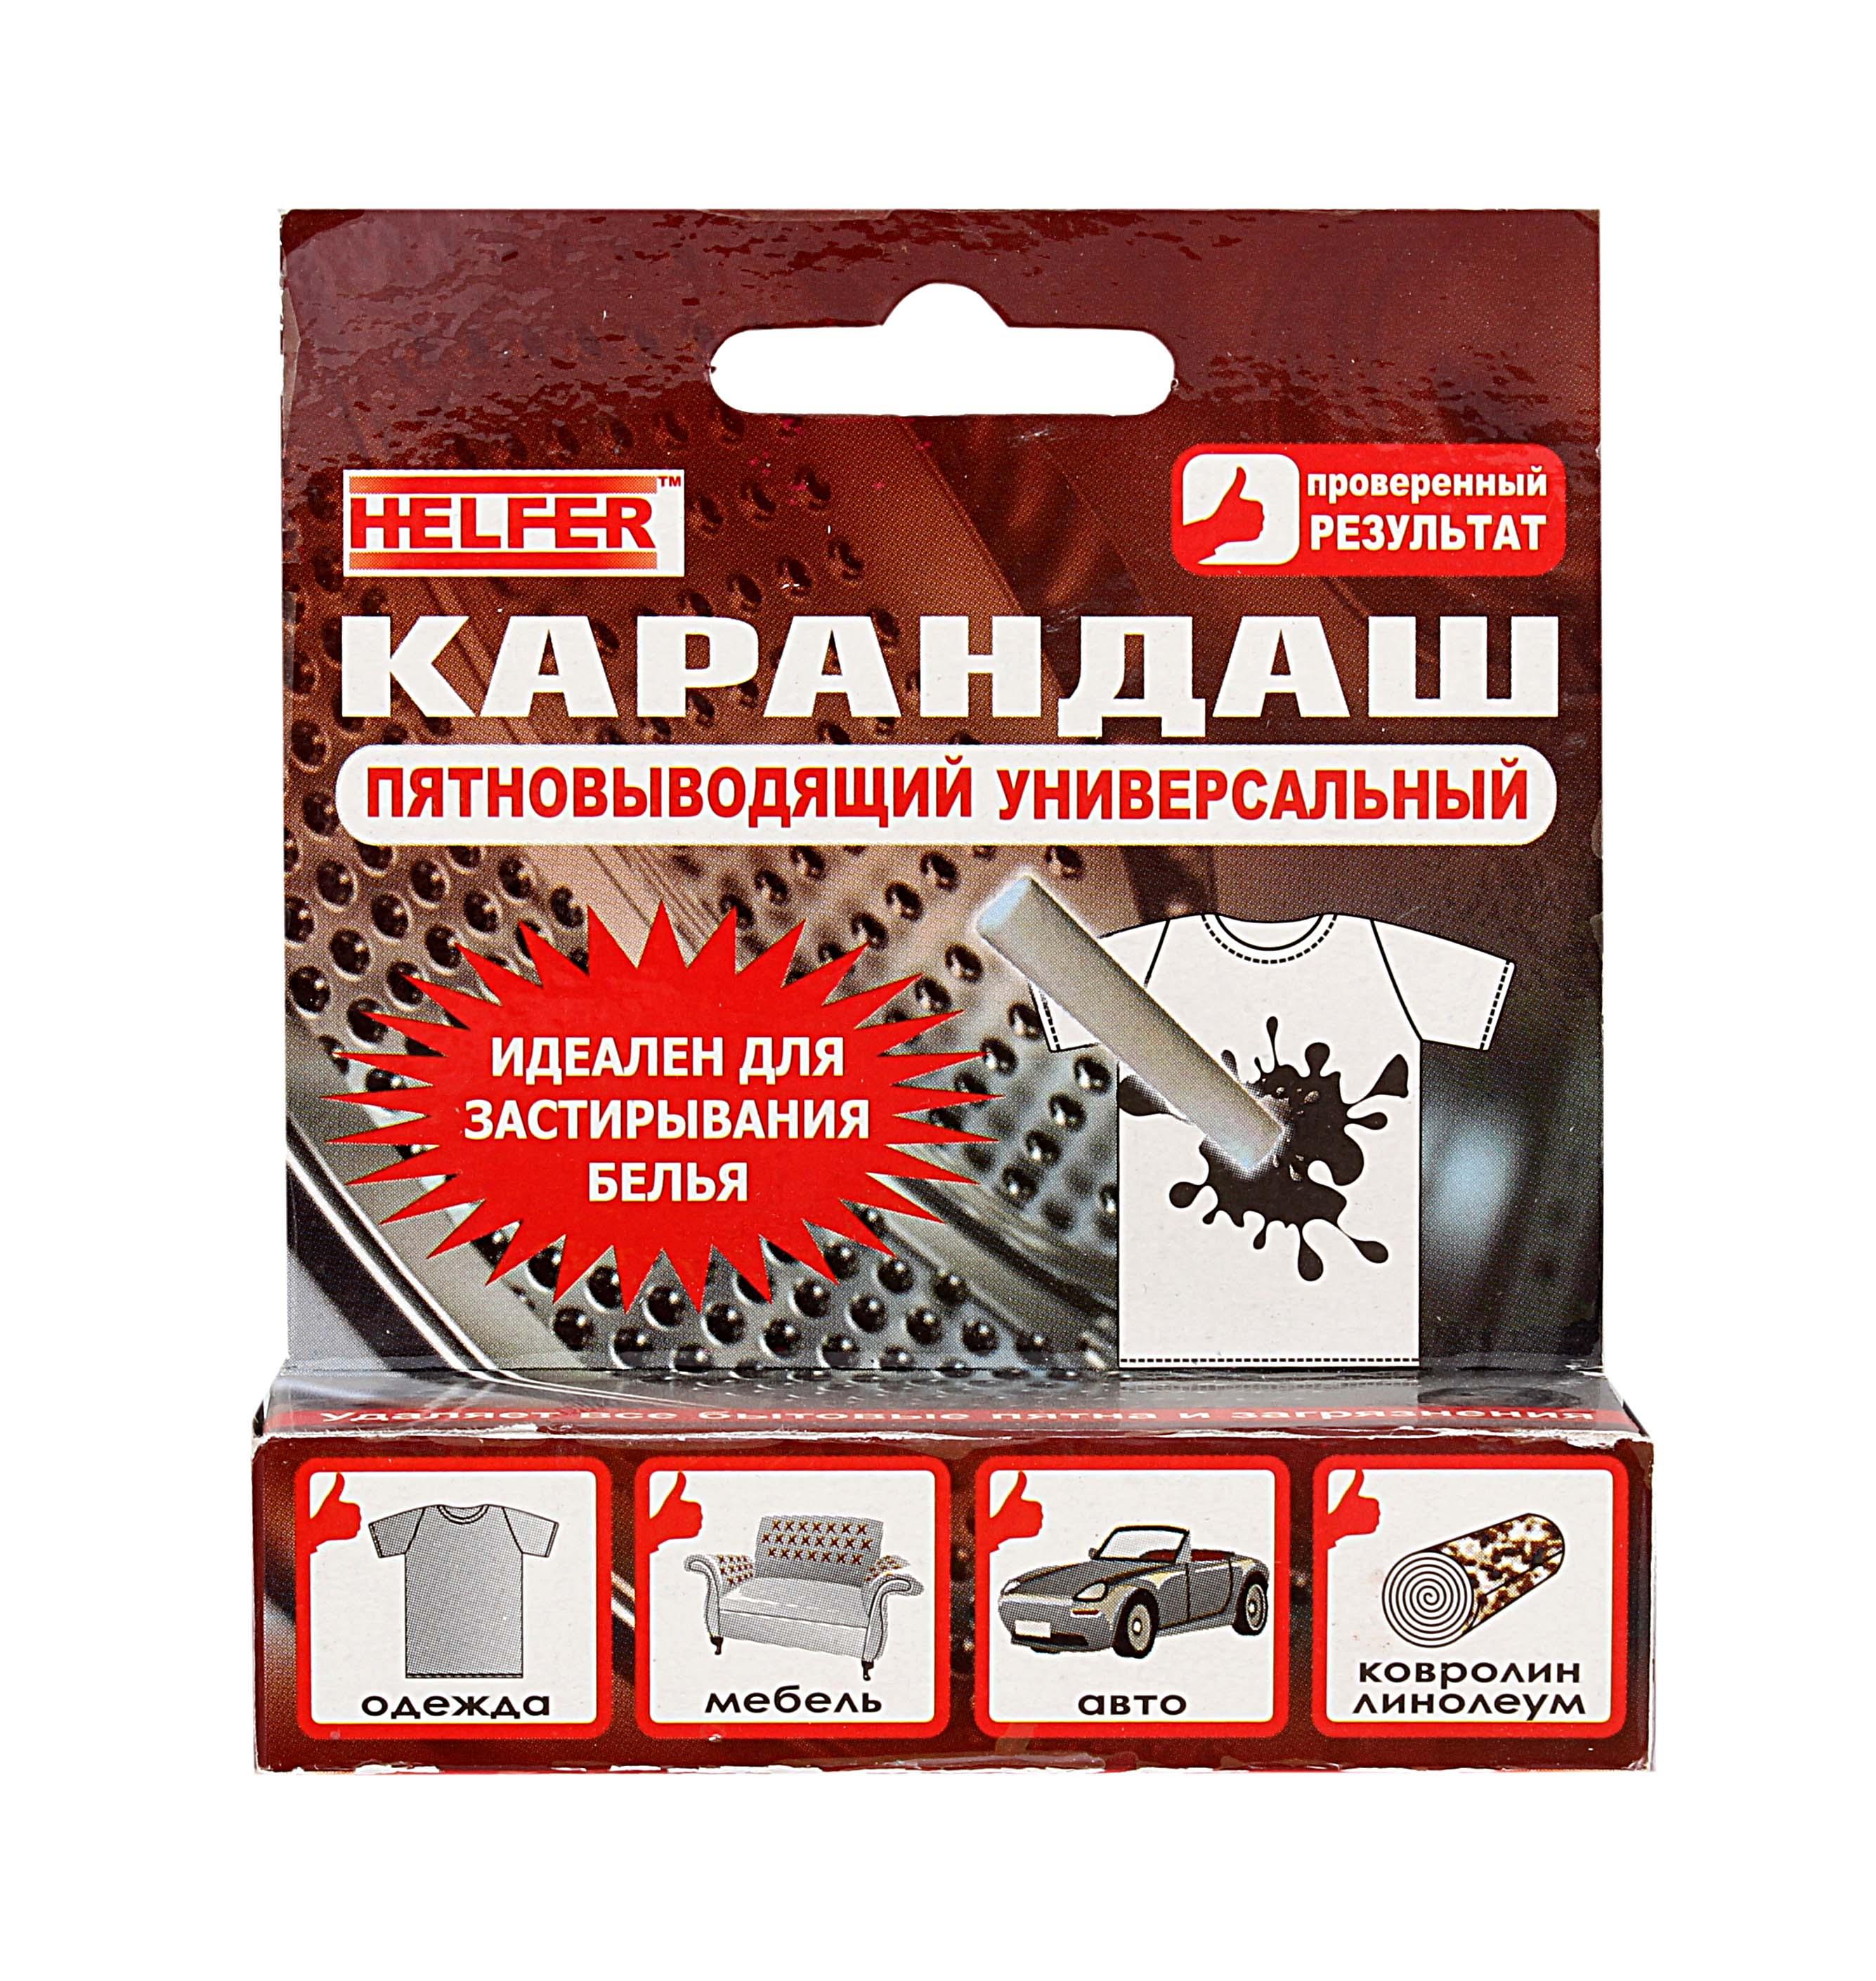 Средства для стирки и от накипи Helfer Real Brand Technics 99.000